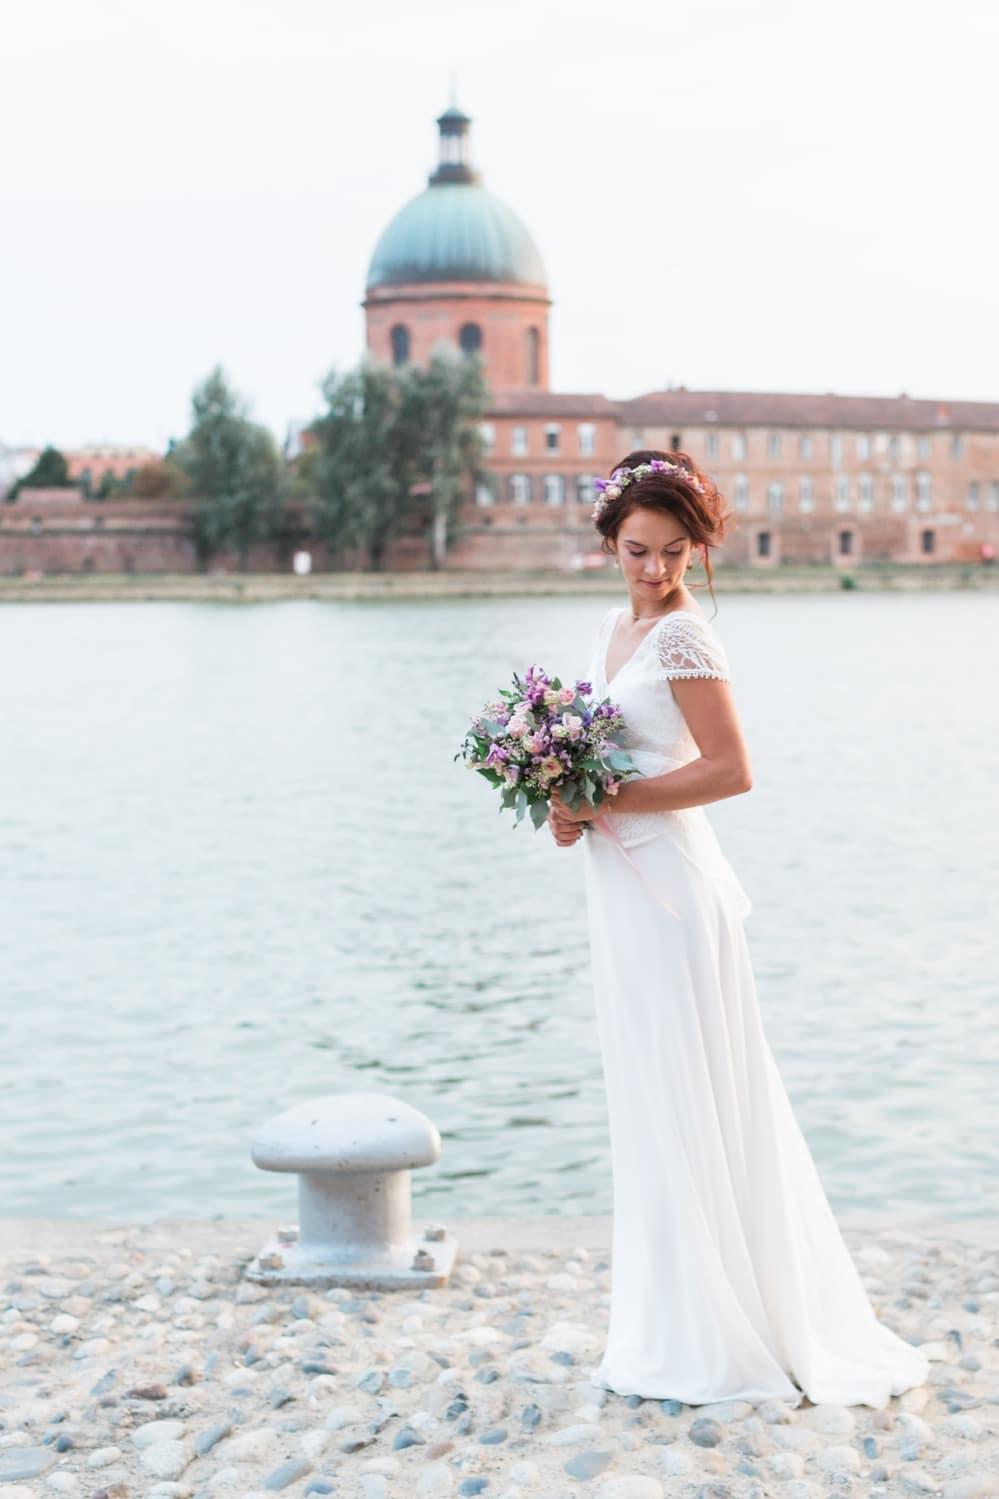 photographe-mariage-toulouse-photo-inspiration-mariee-seance-photo